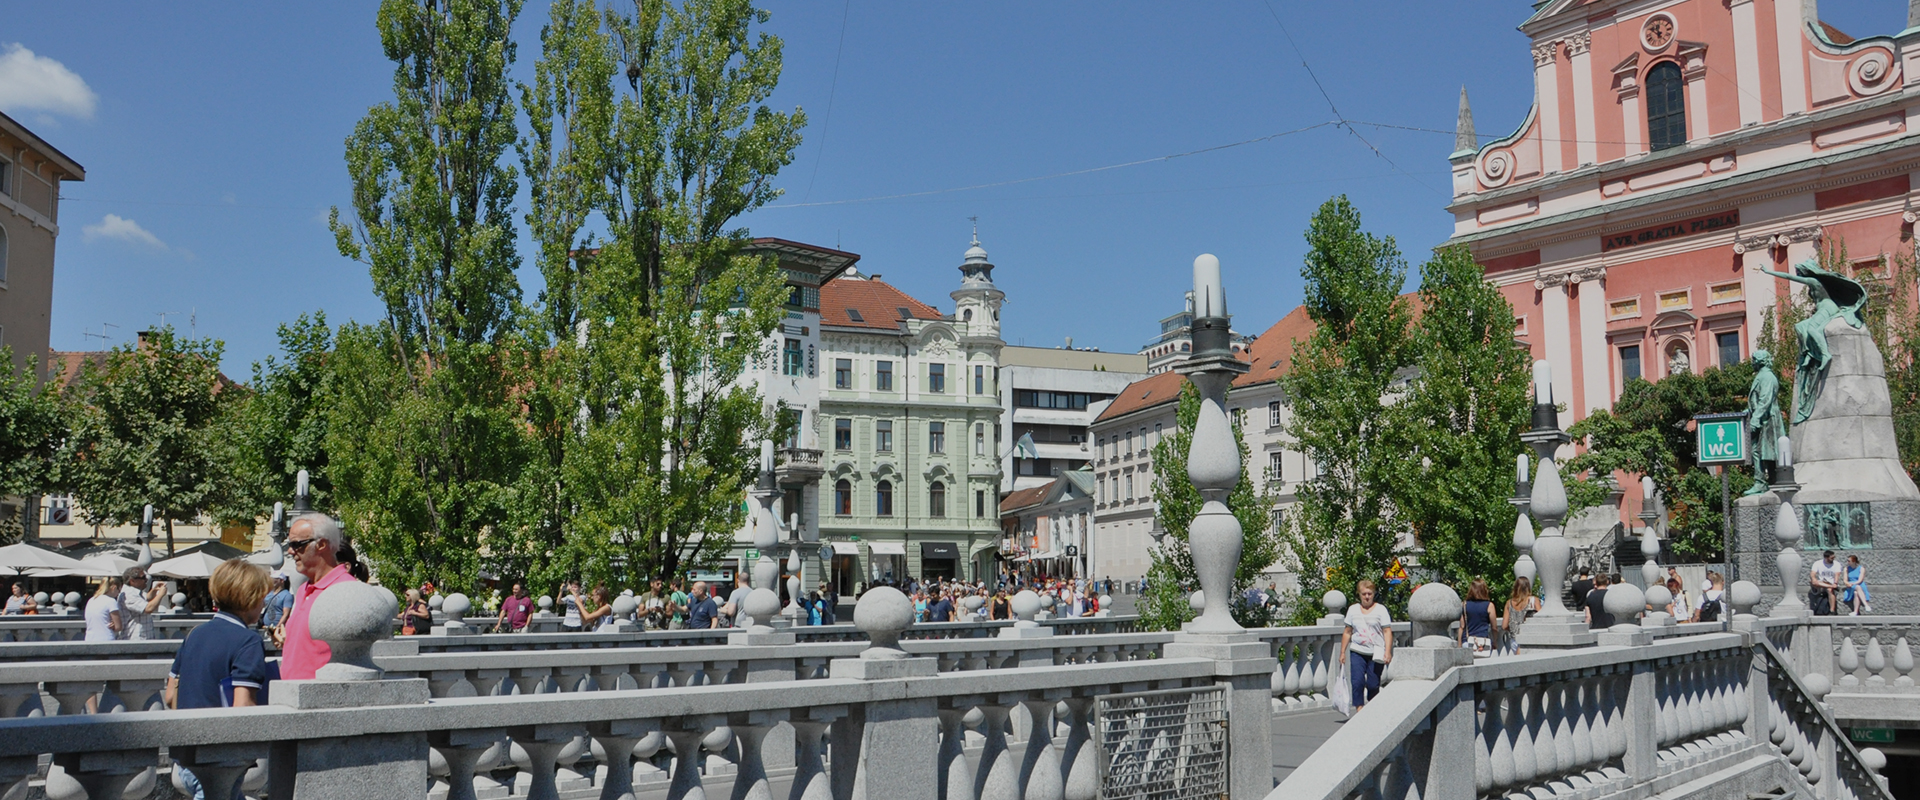 Lubiana | Slovenia